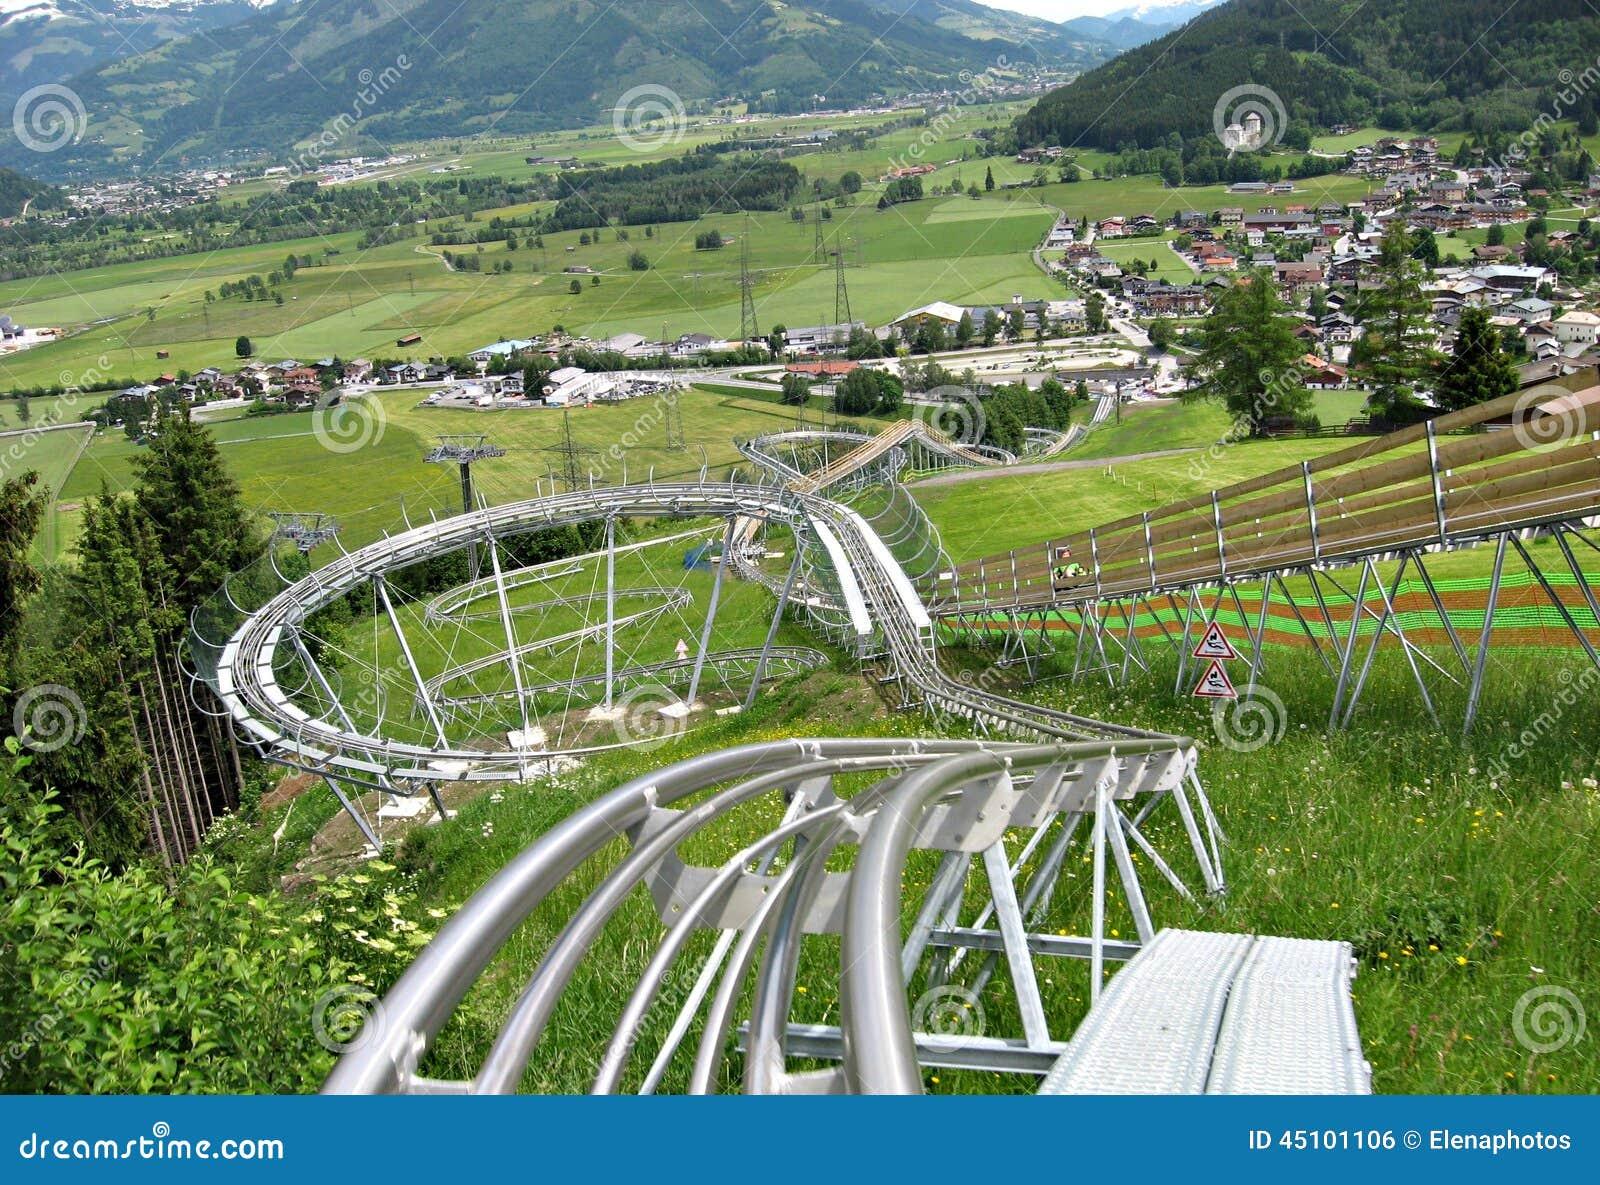 Alpine Coaster In Kaprun Stock Photo Image 45101106